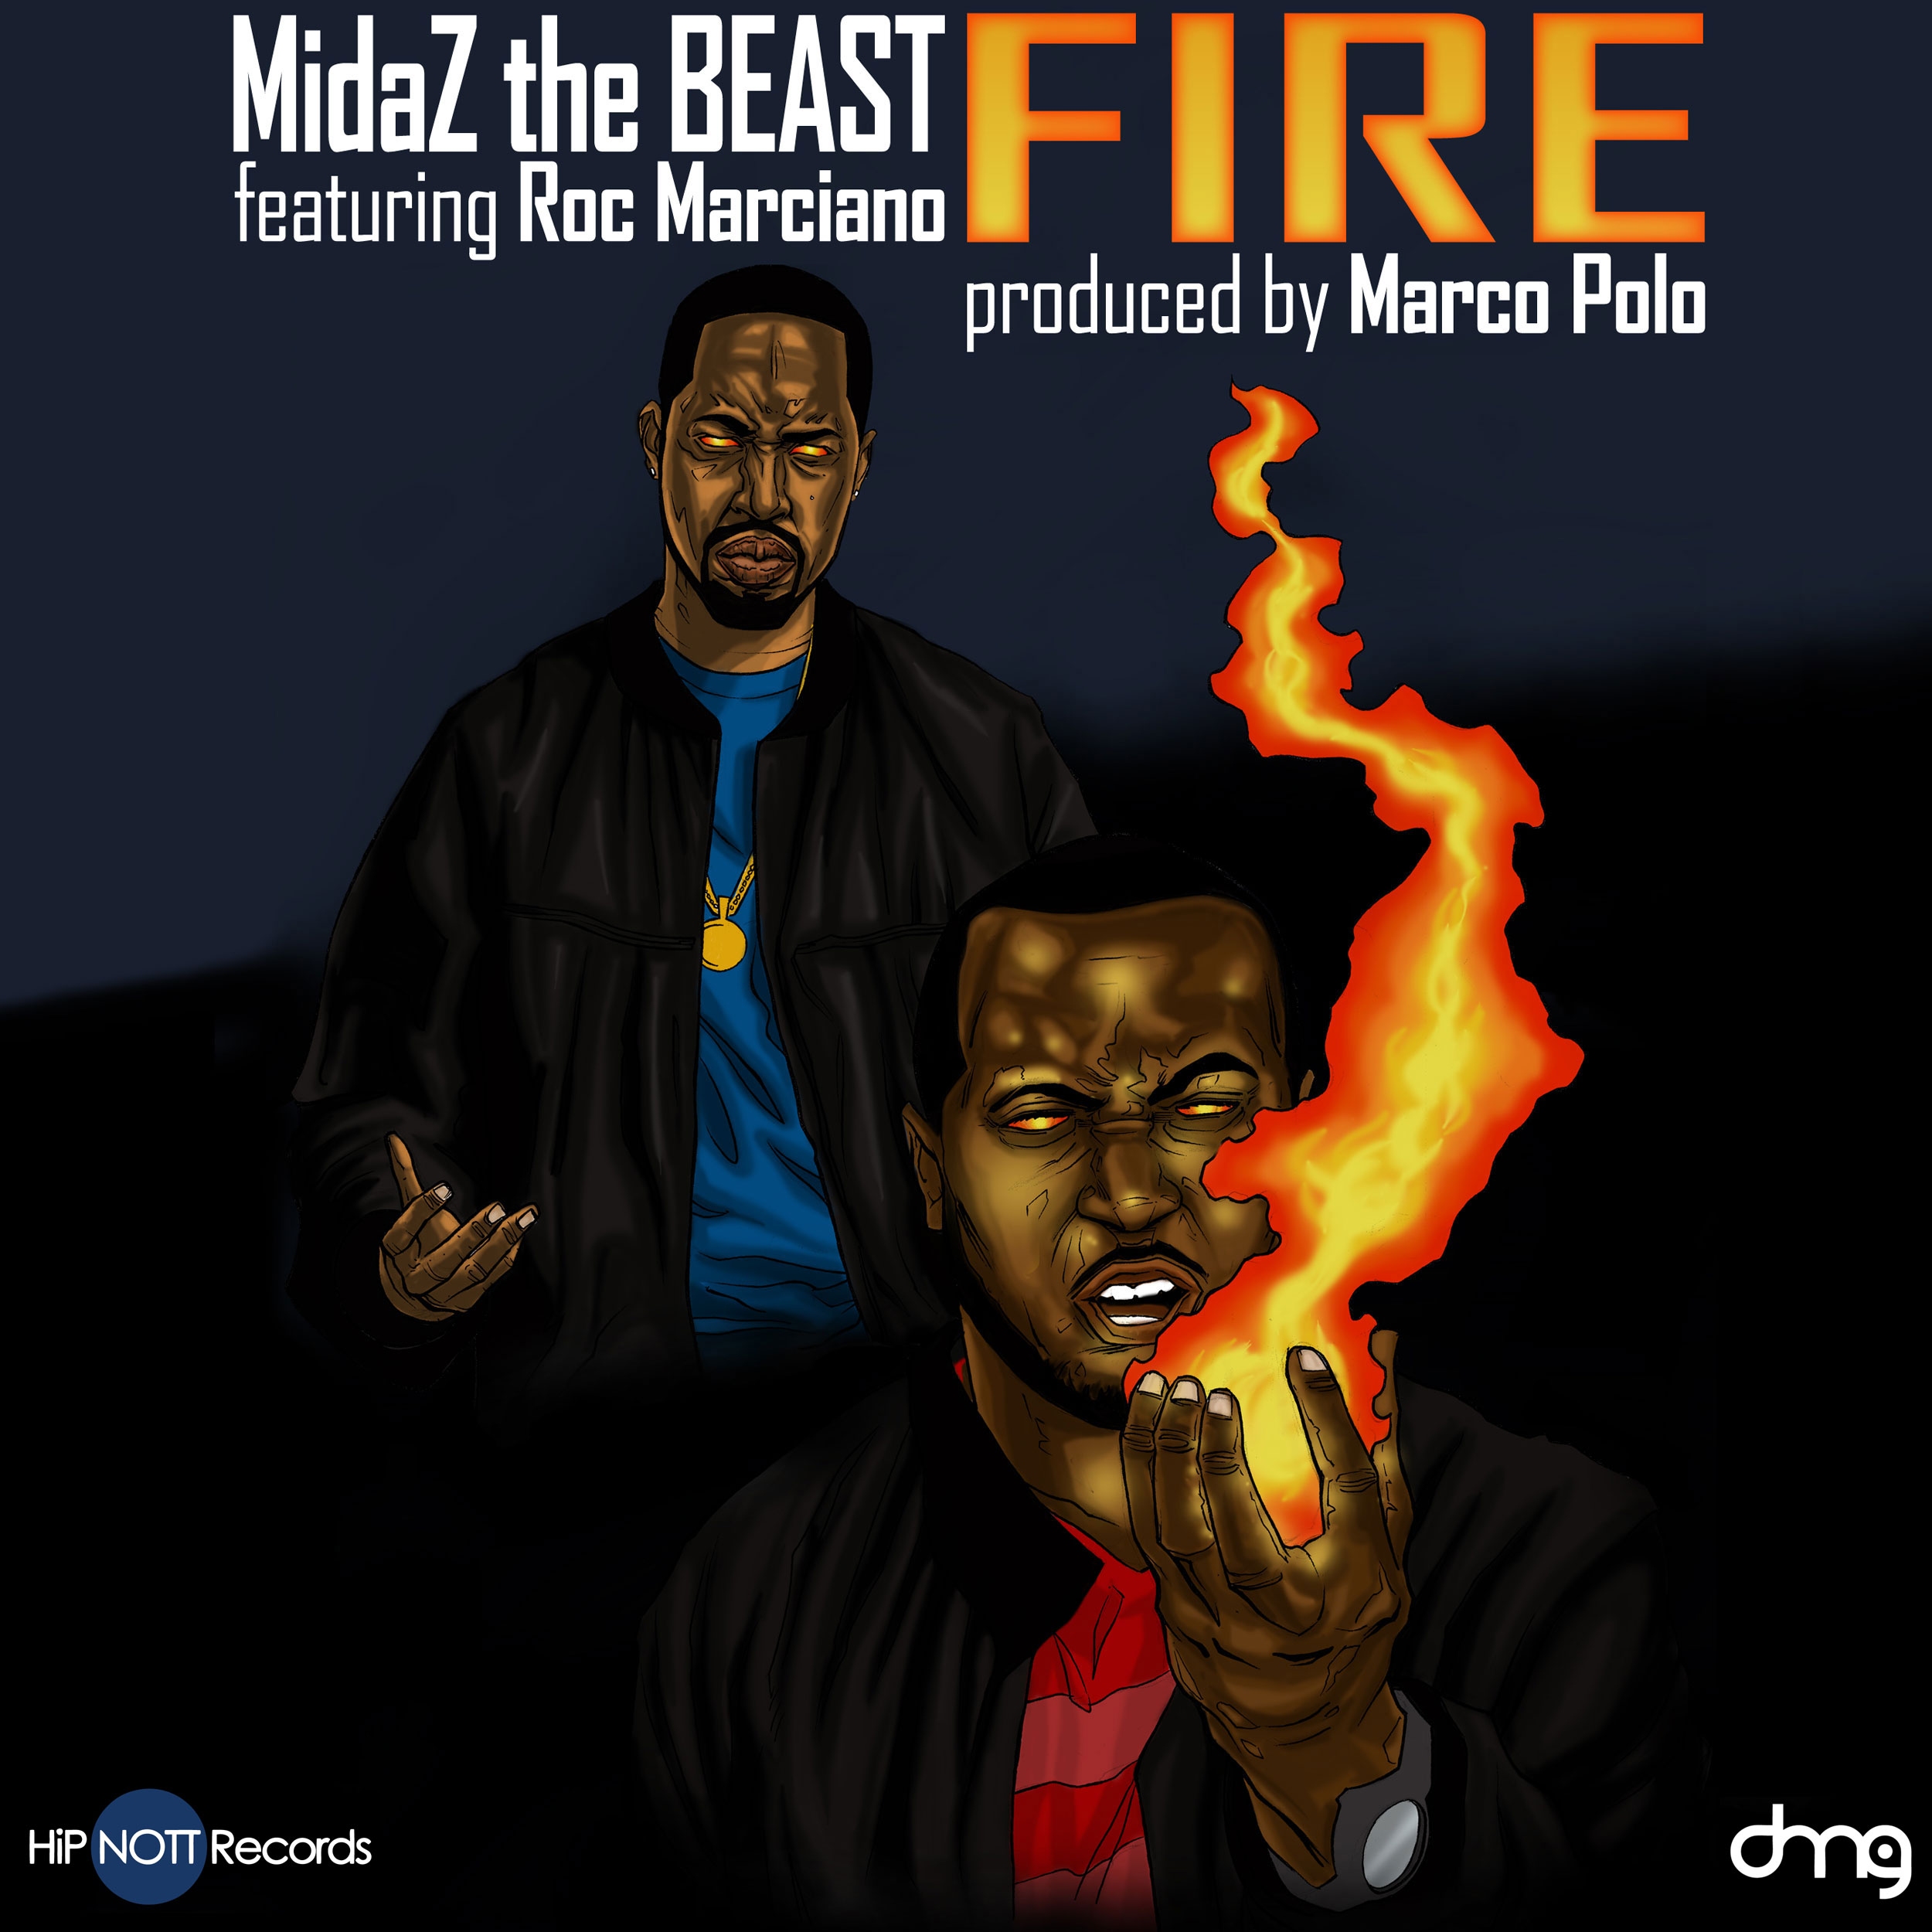 MidaZ The Beast Fire